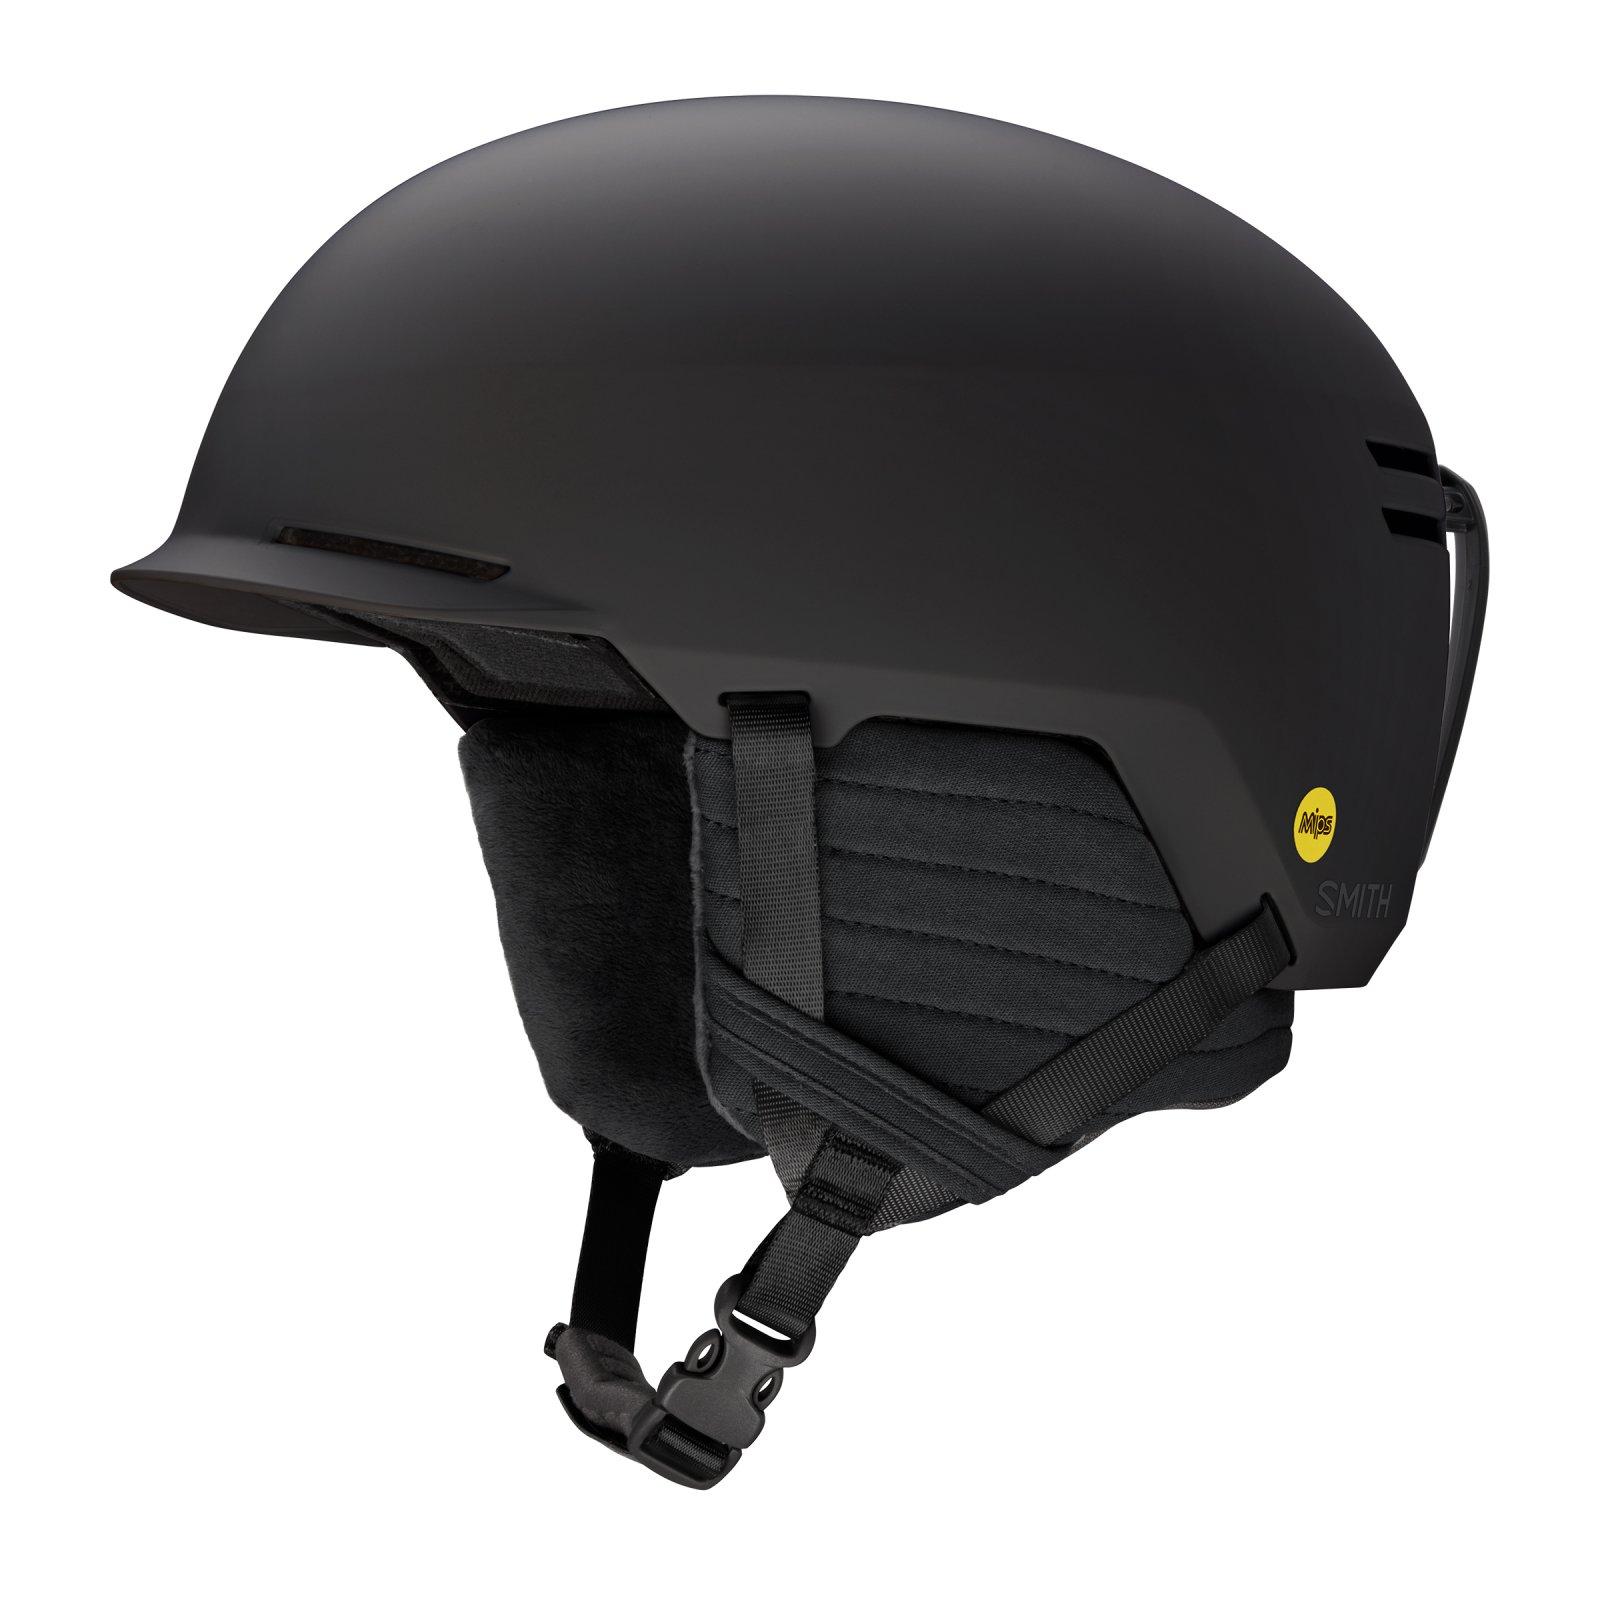 2022 Smith Scout MIPS Snow Helmet